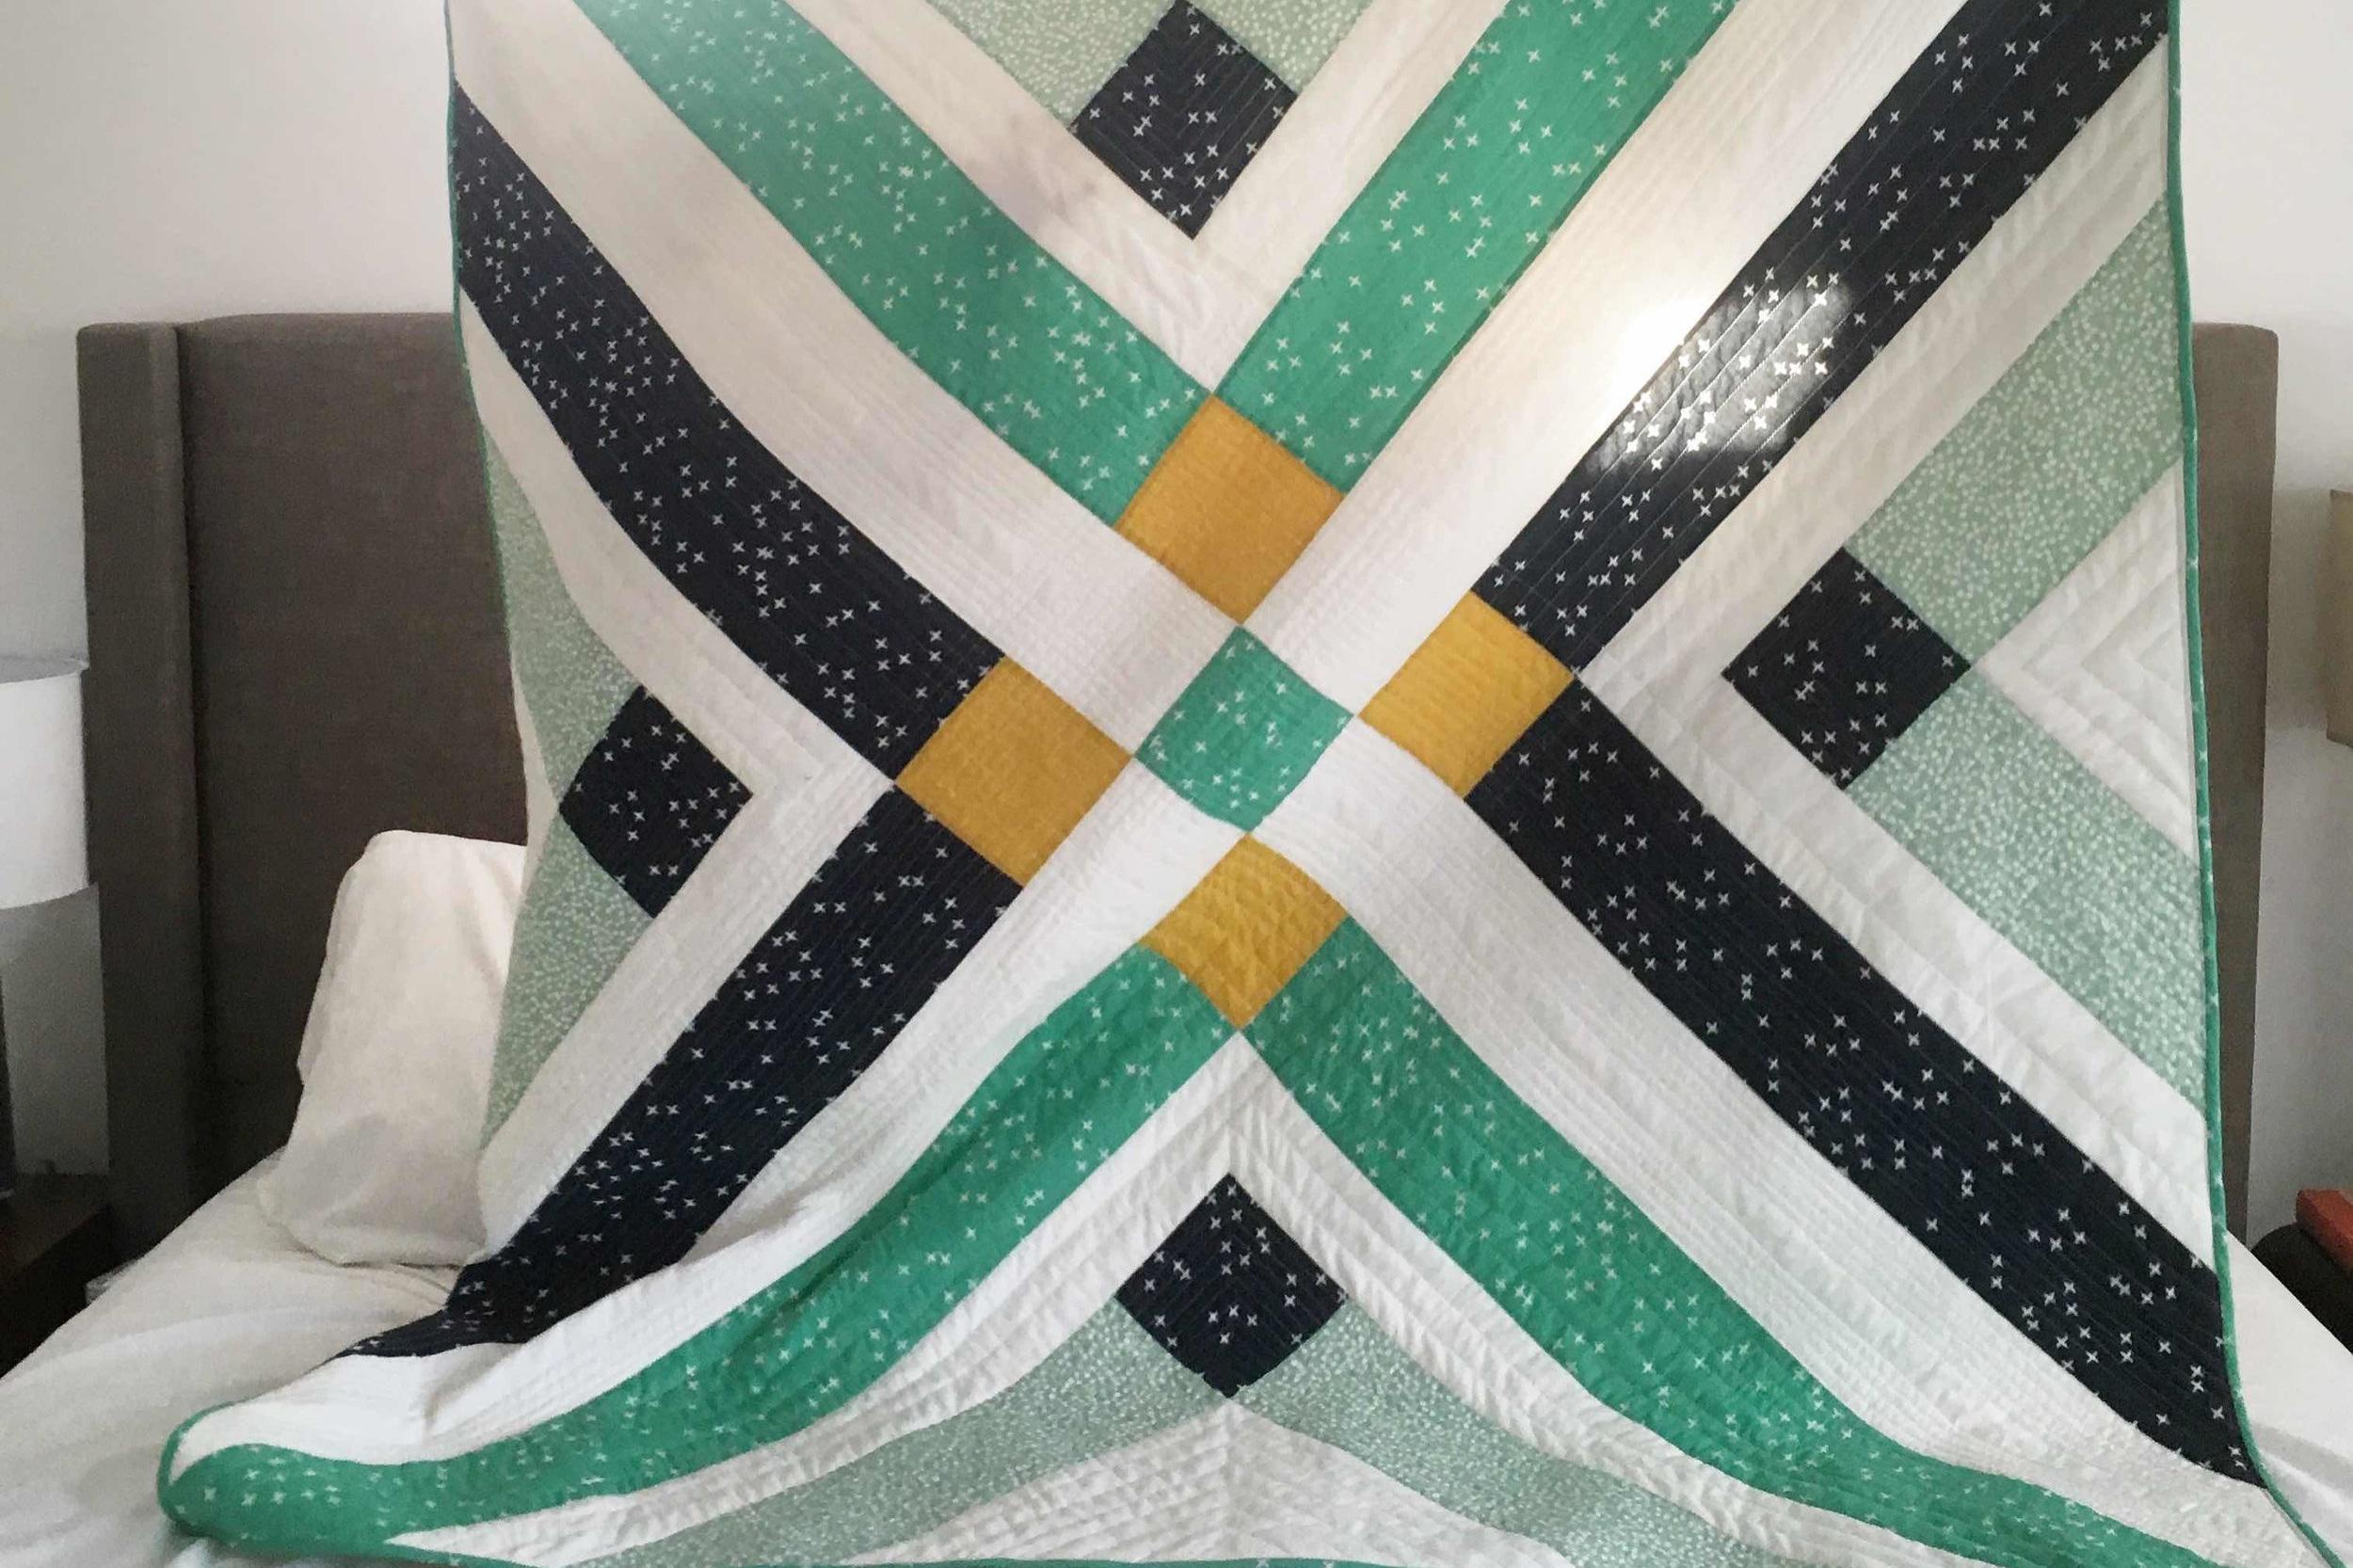 Hacienda - 55x63 | 2018, Quilt 005Retro Plaid by Suzy Quilts